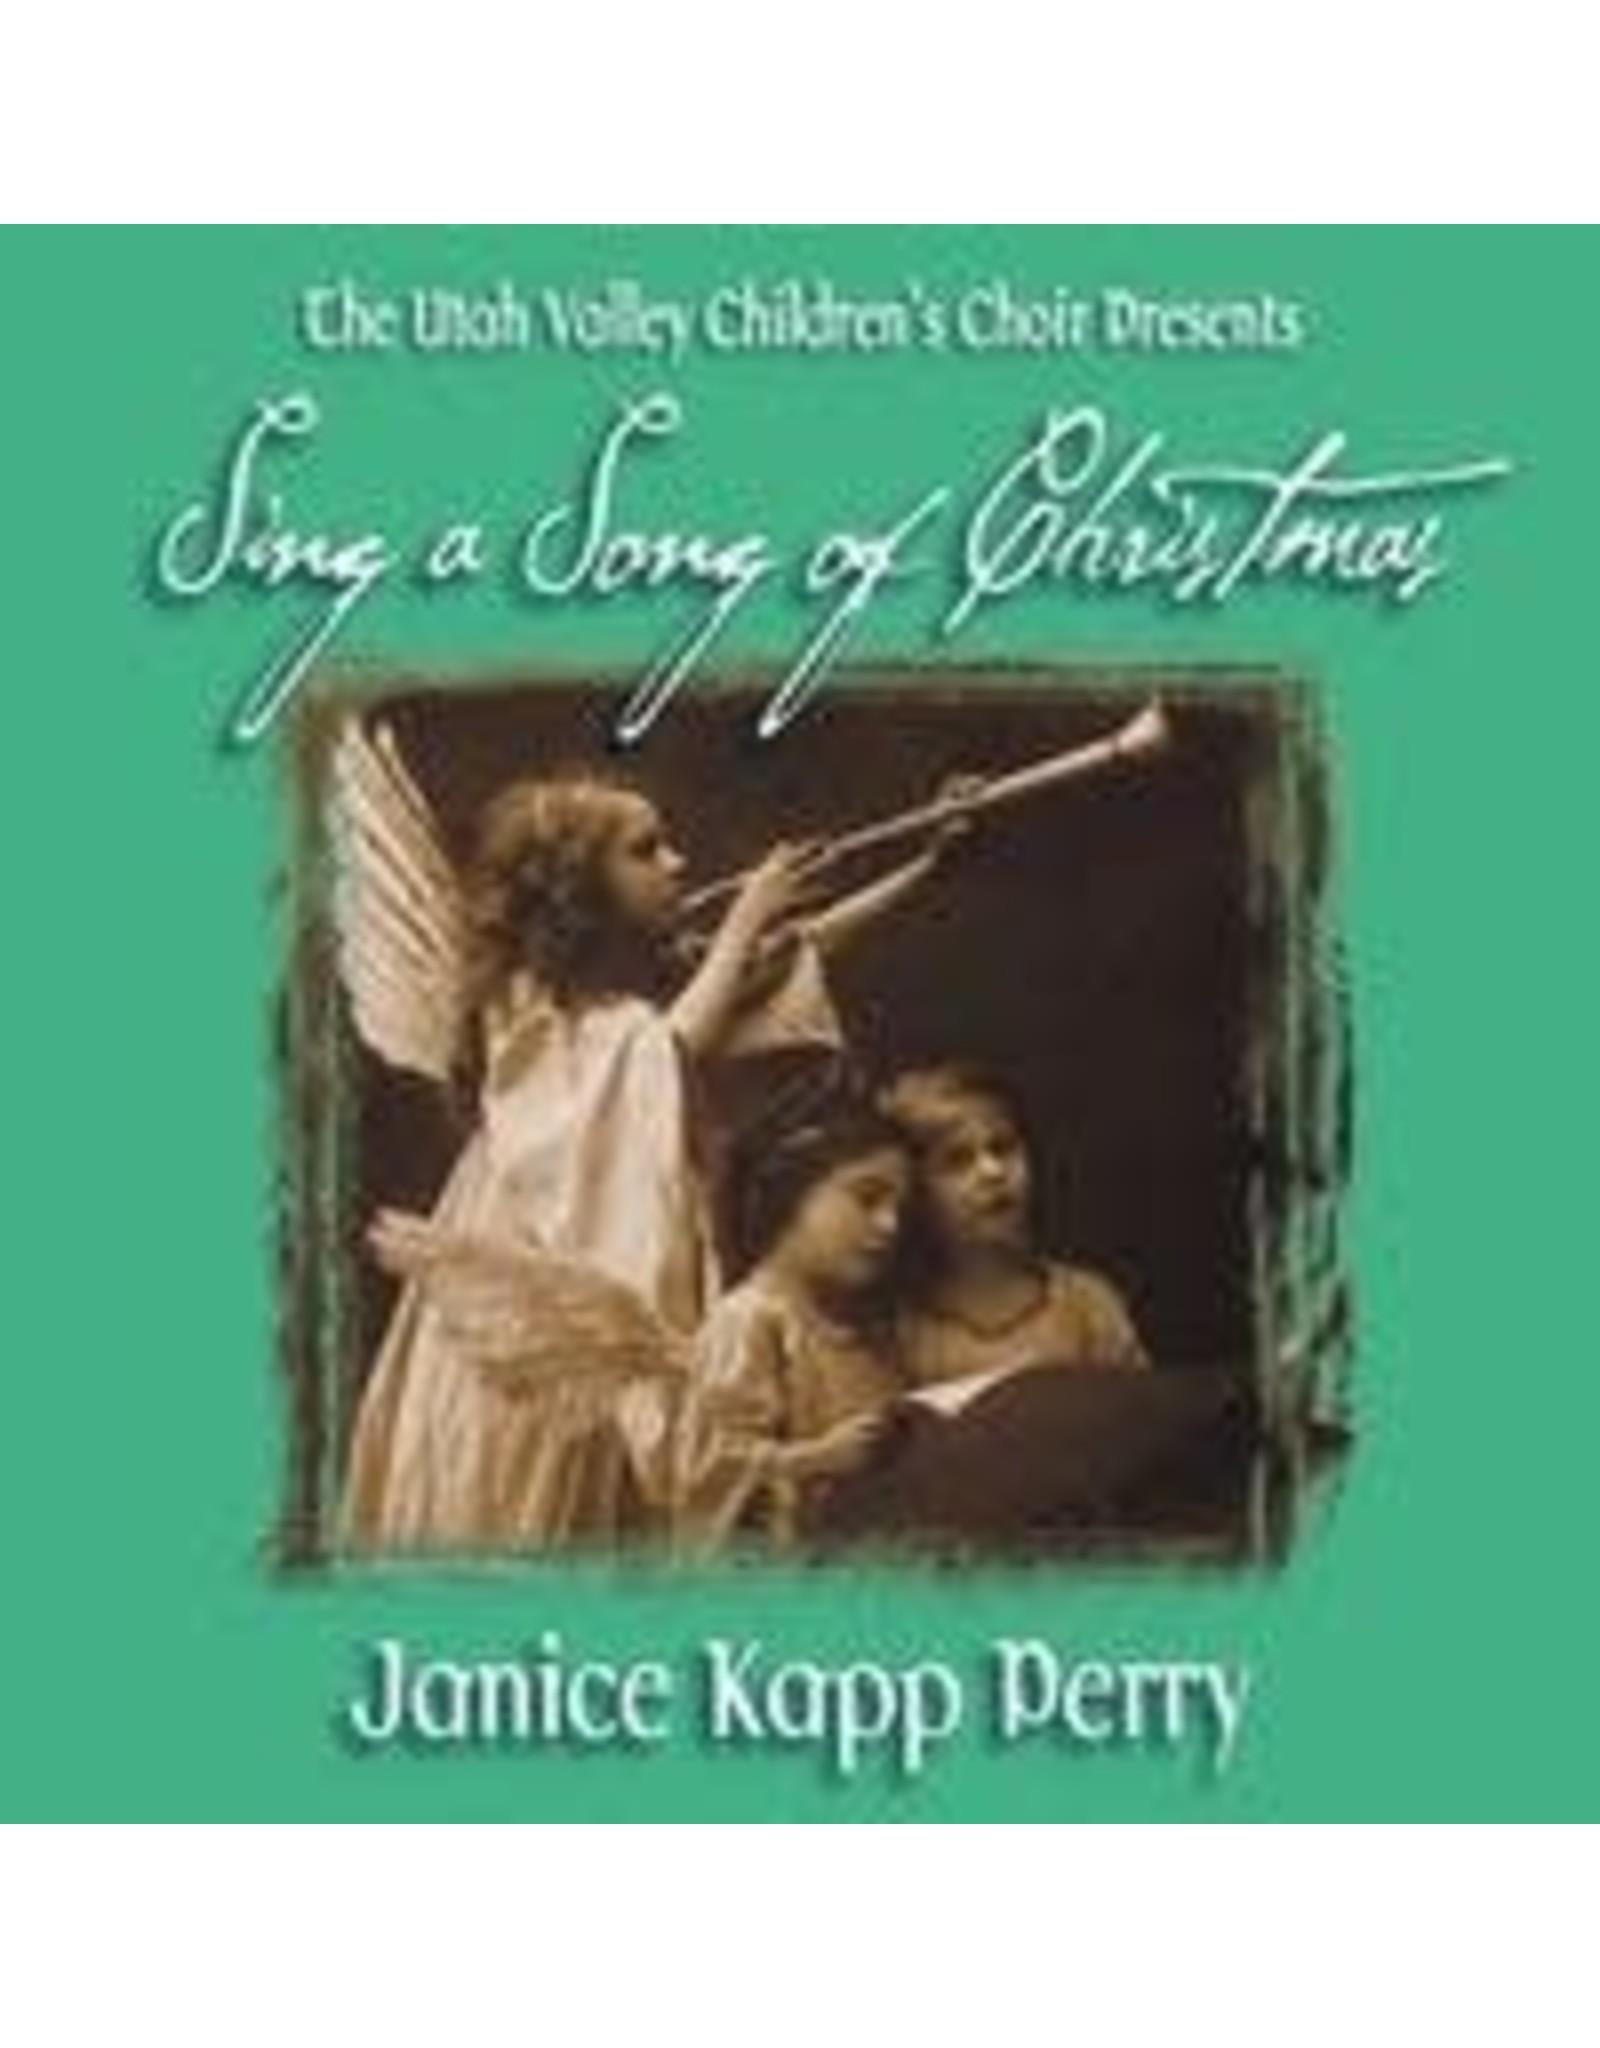 Jackman Music Sing a Song of Christmas Cantata CD